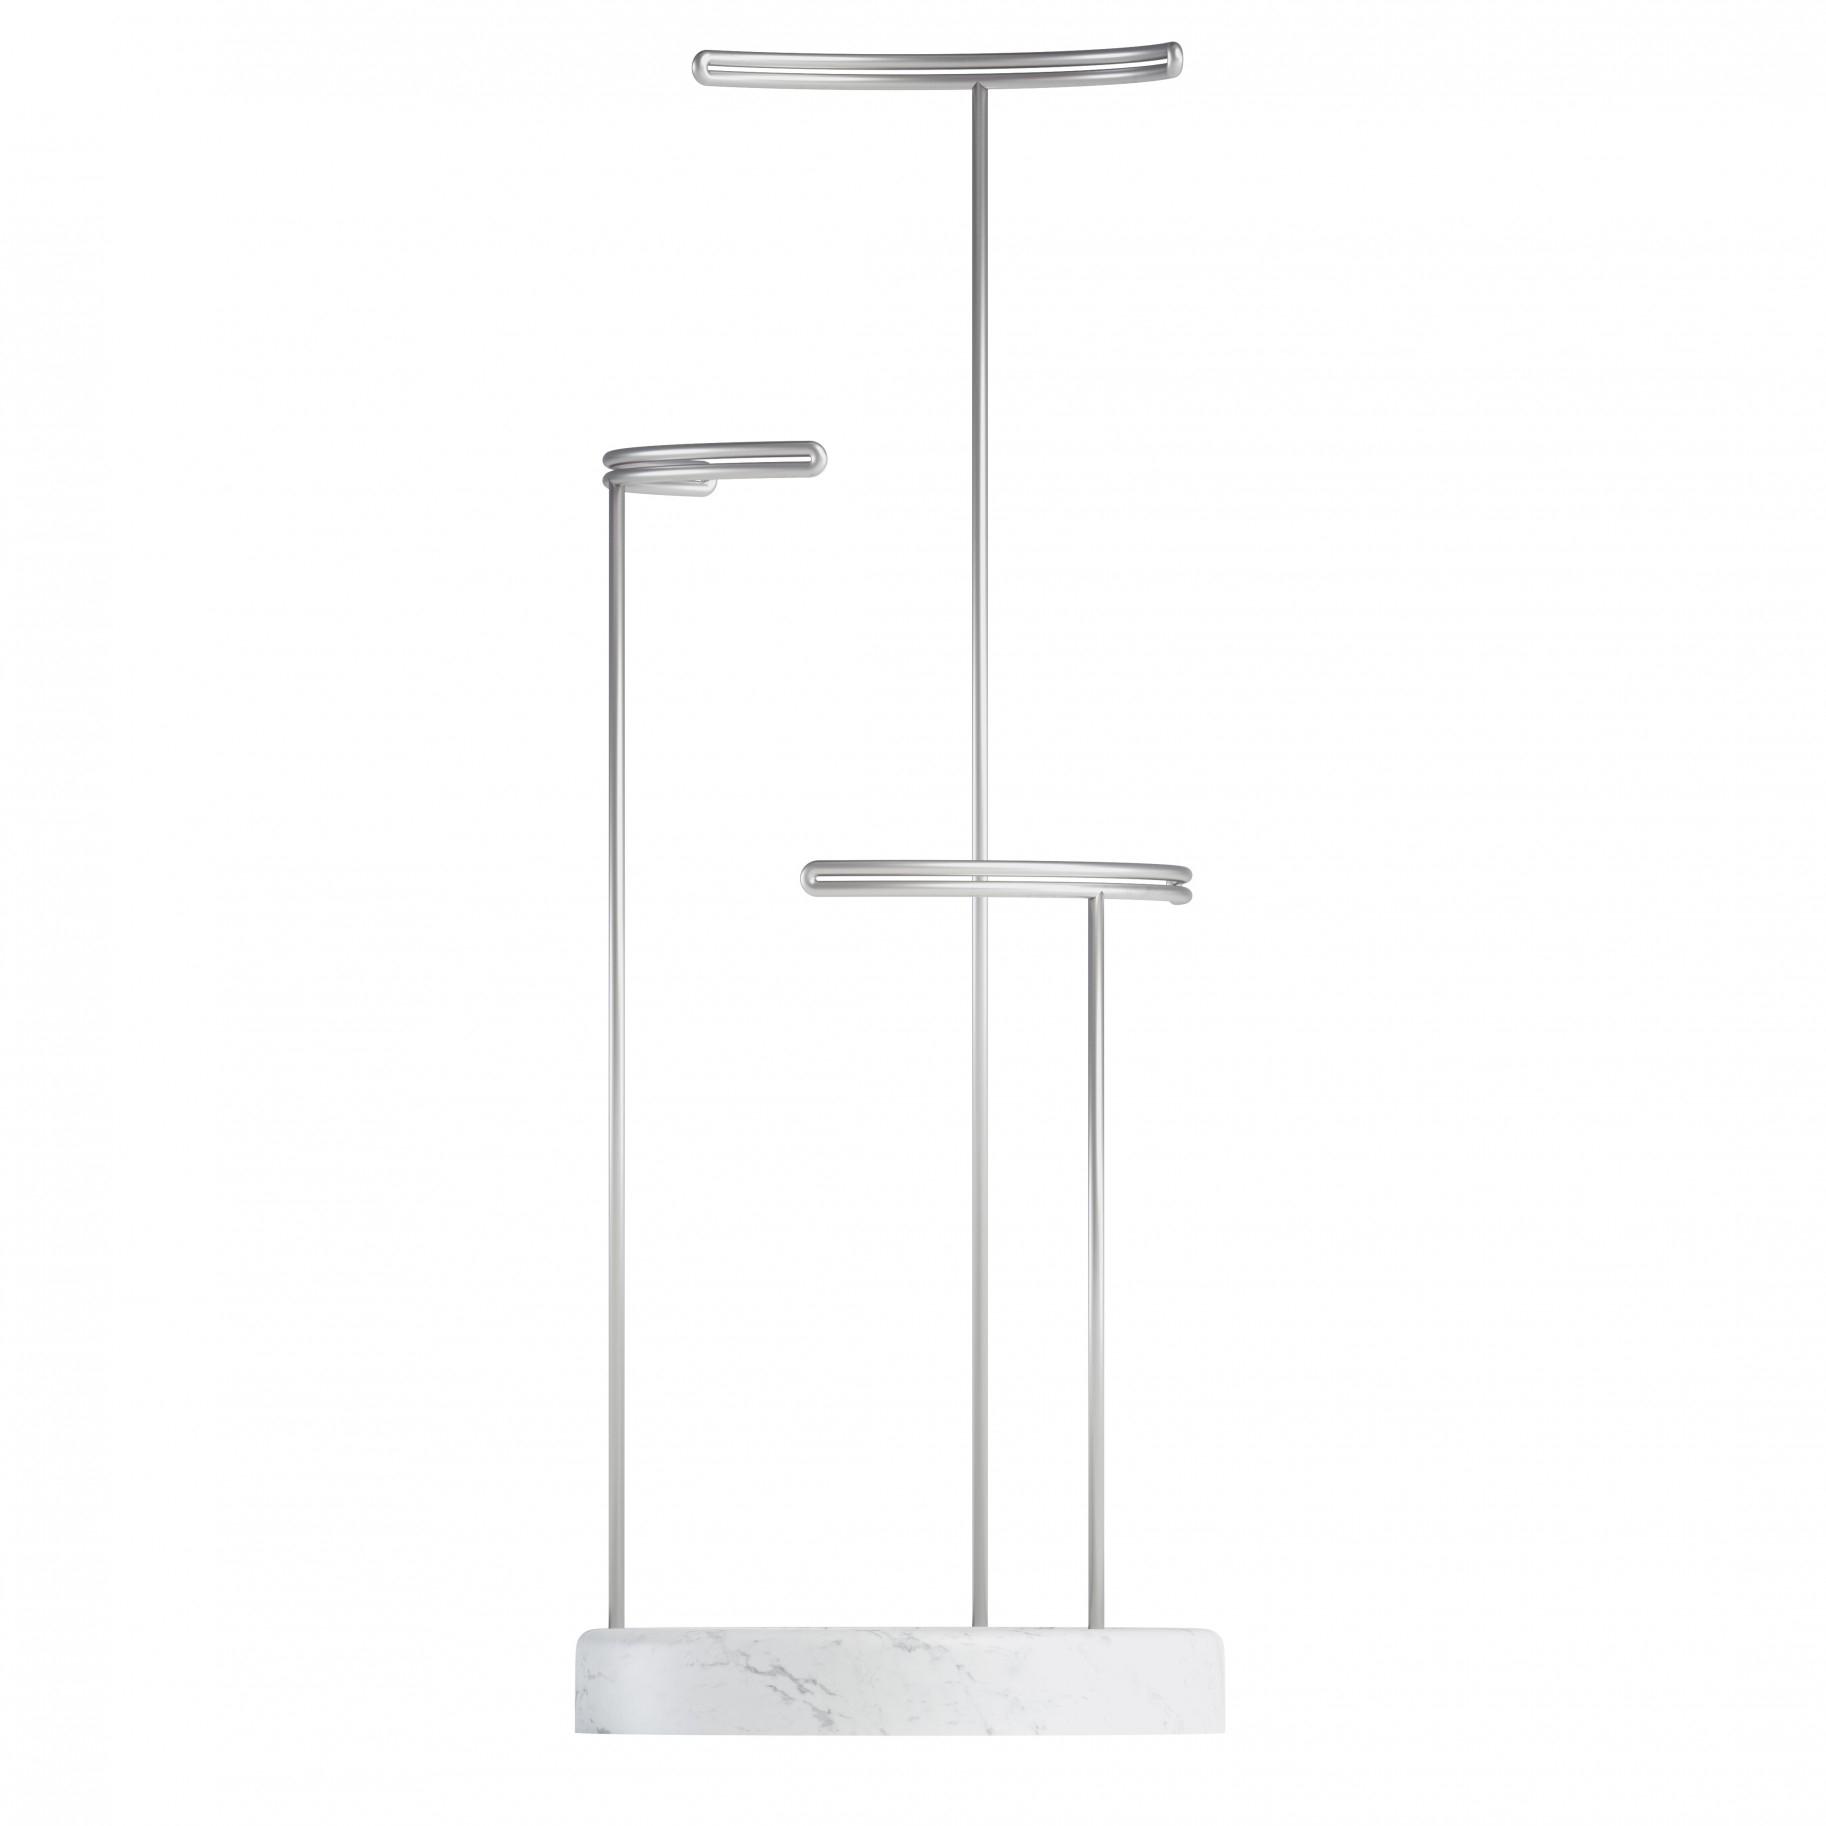 Umbra tesora marble jewelry stand